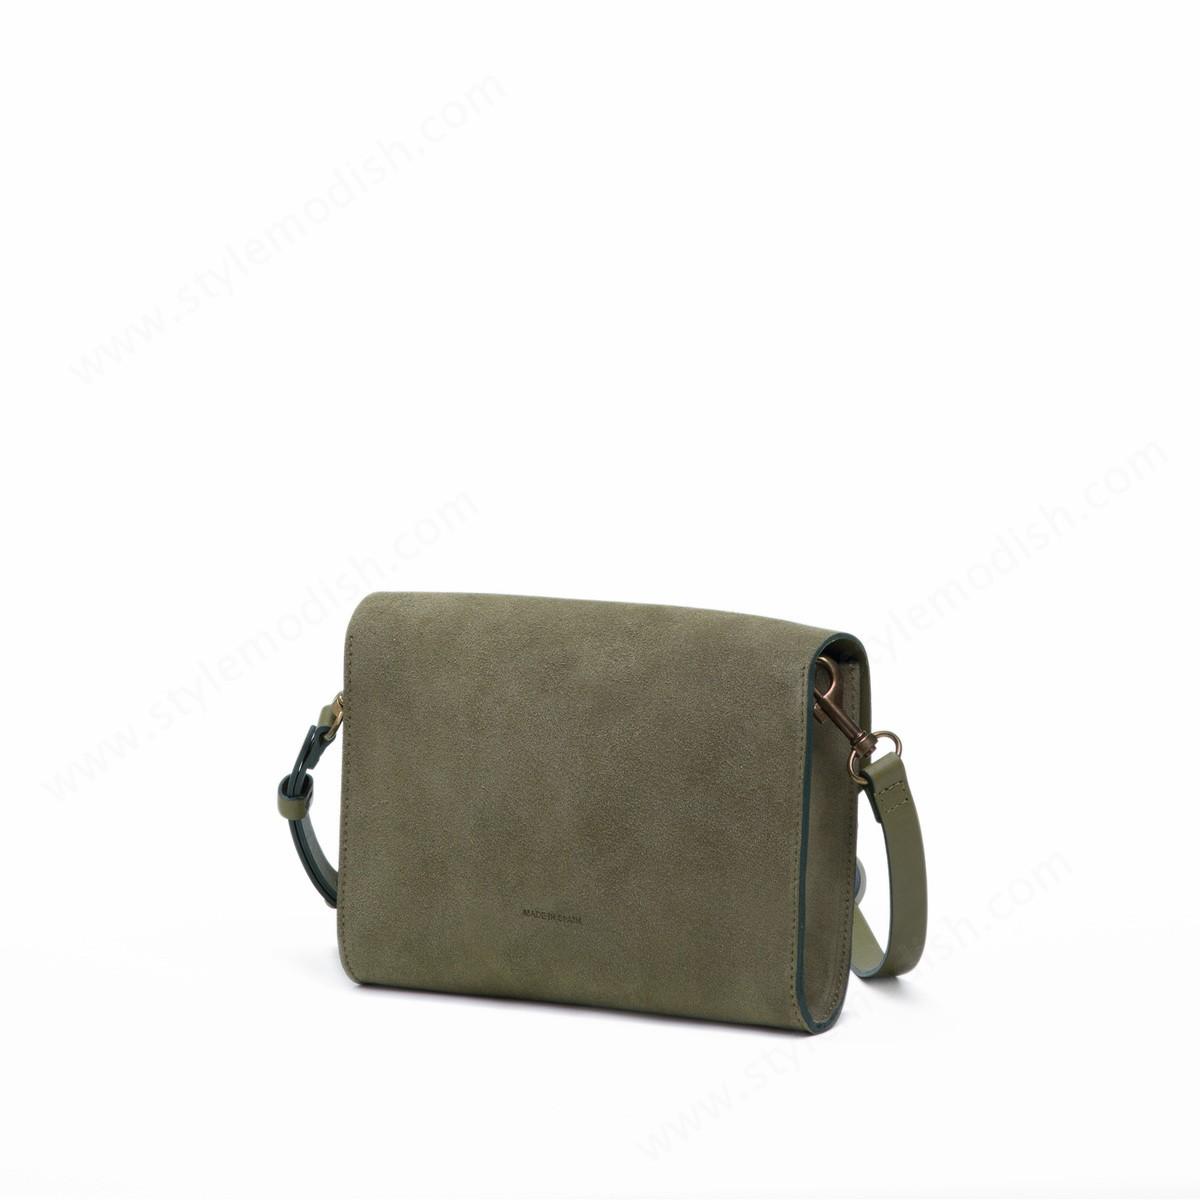 Women's Vereverto Mini Mox Bags & Purses - Women's Vereverto Mini Mox Bags & Purses